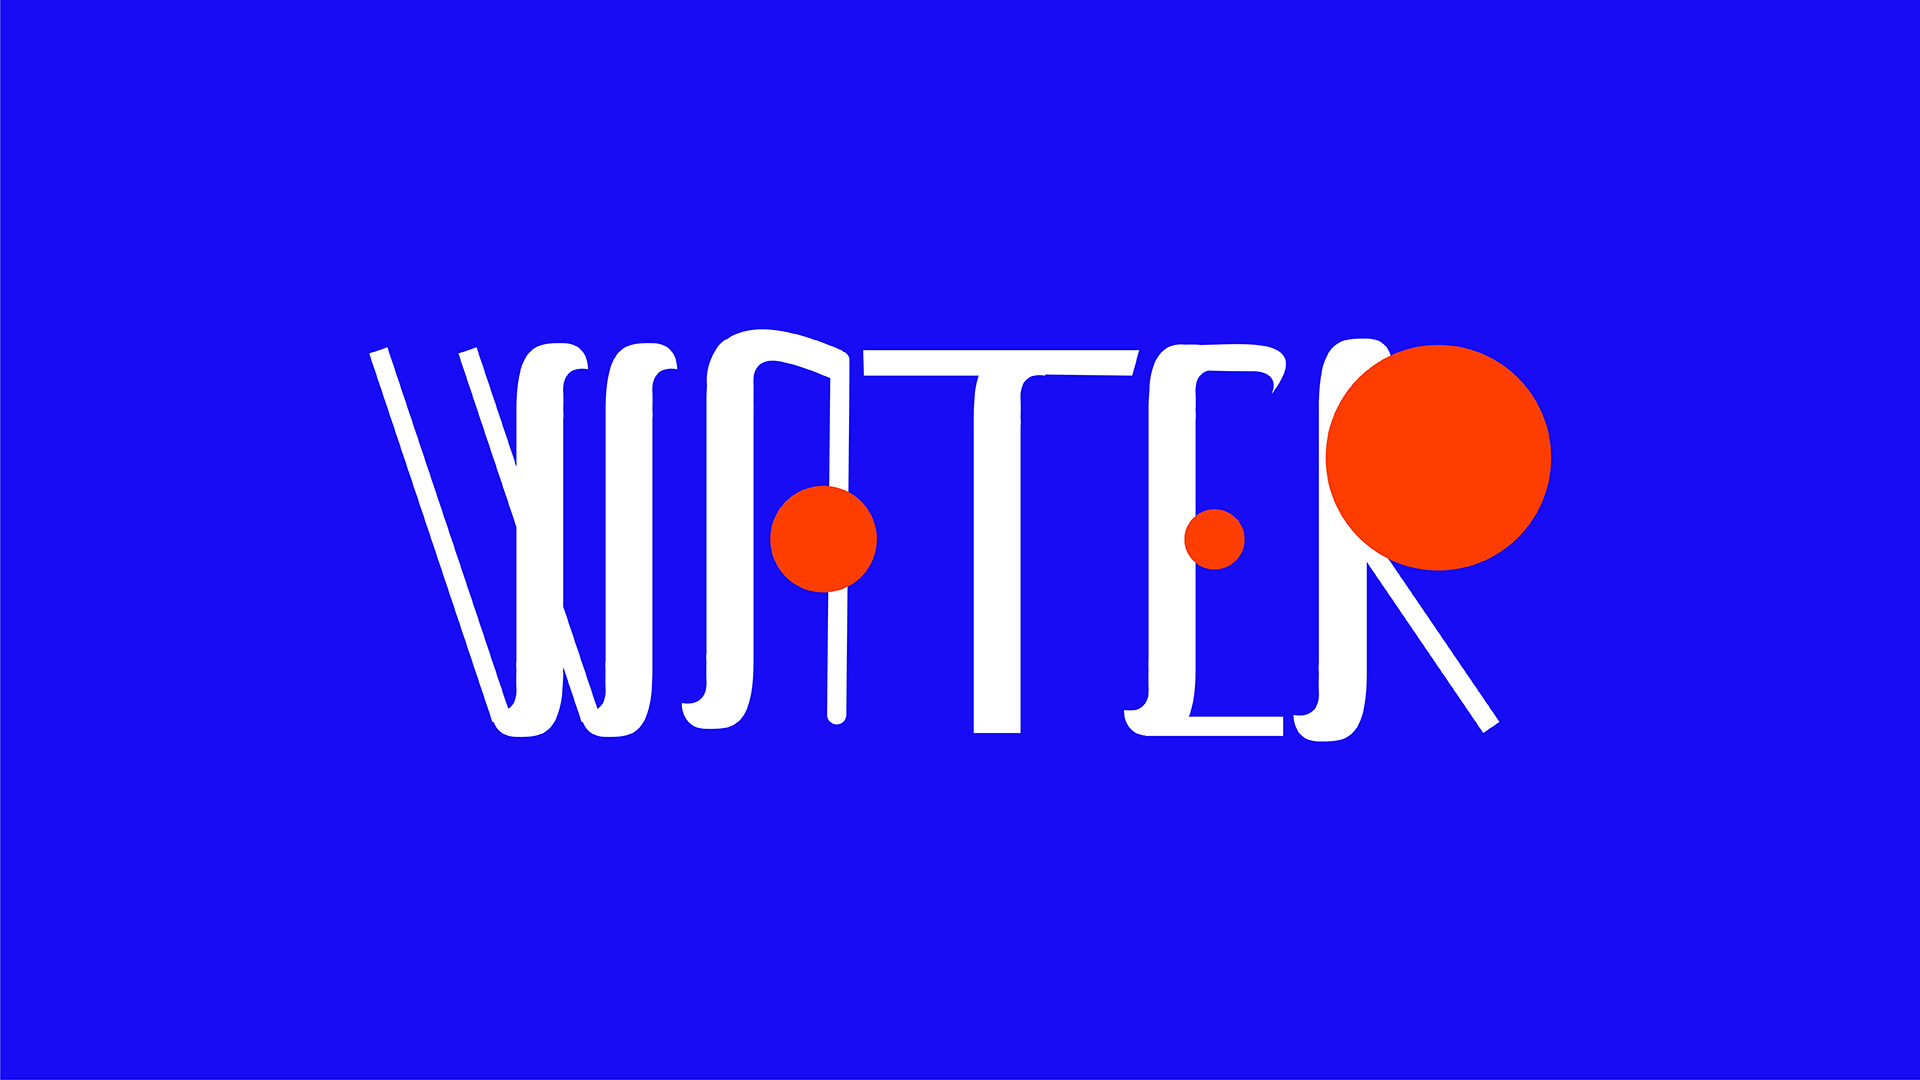 custom type design in bright blue, orange and white